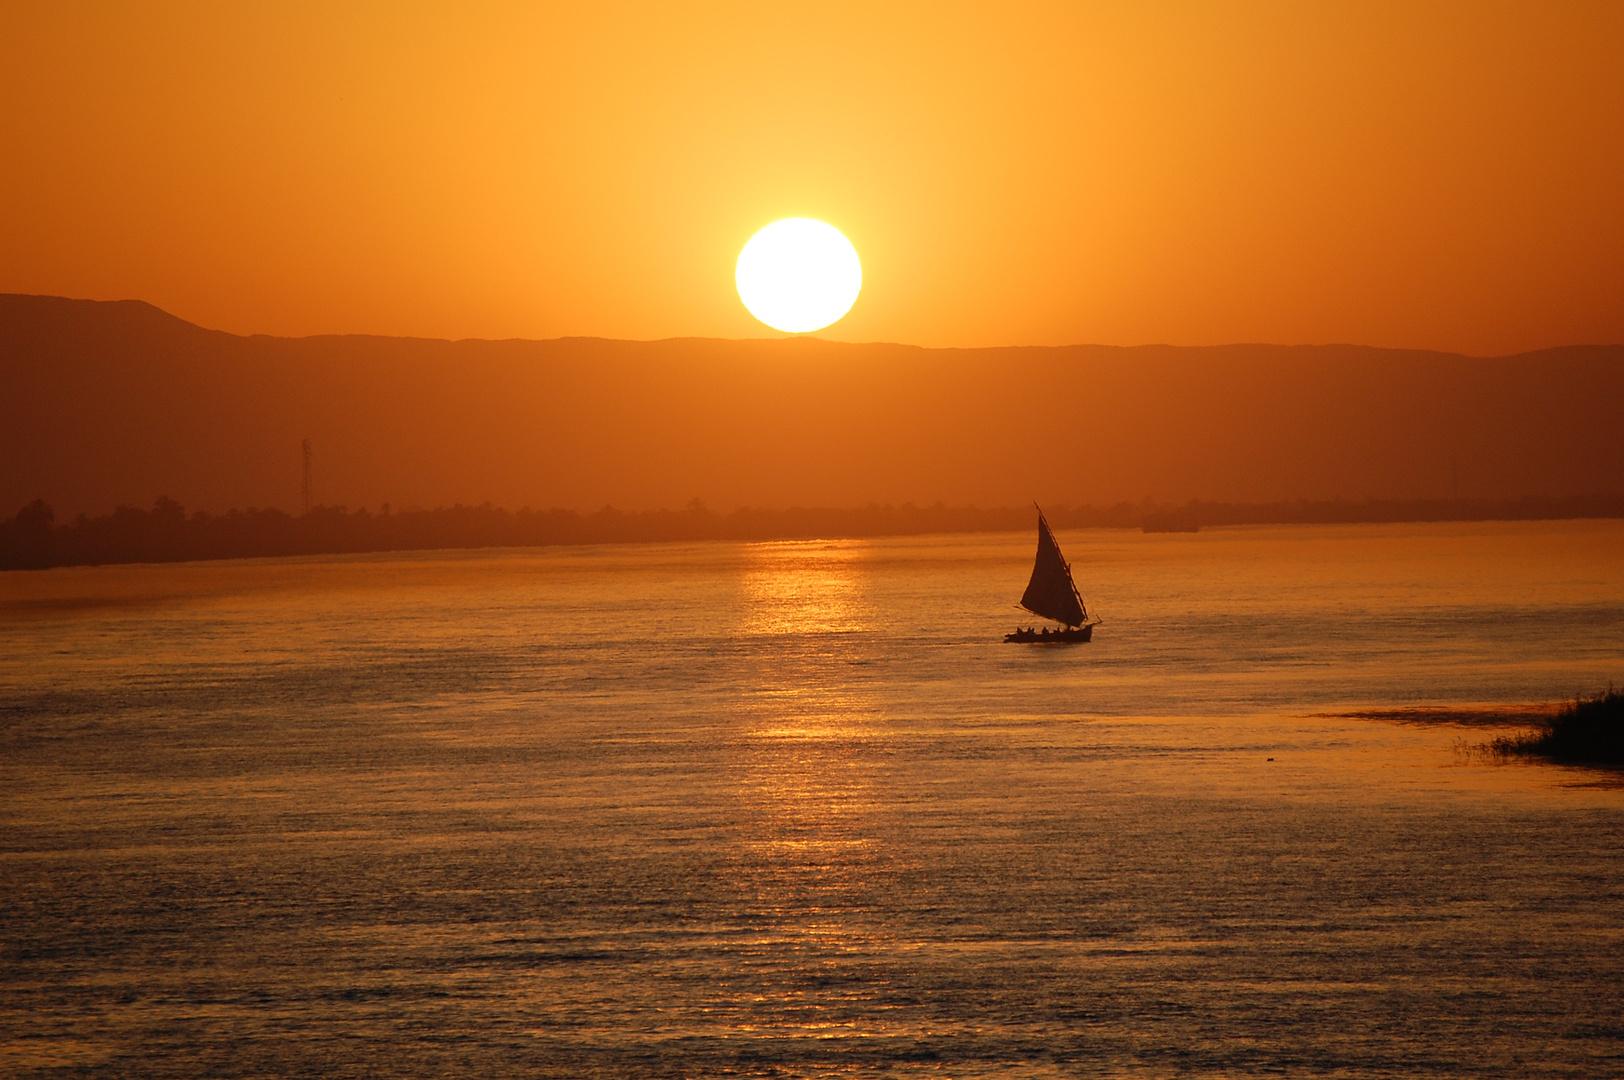 Segeln in die Abendsonne